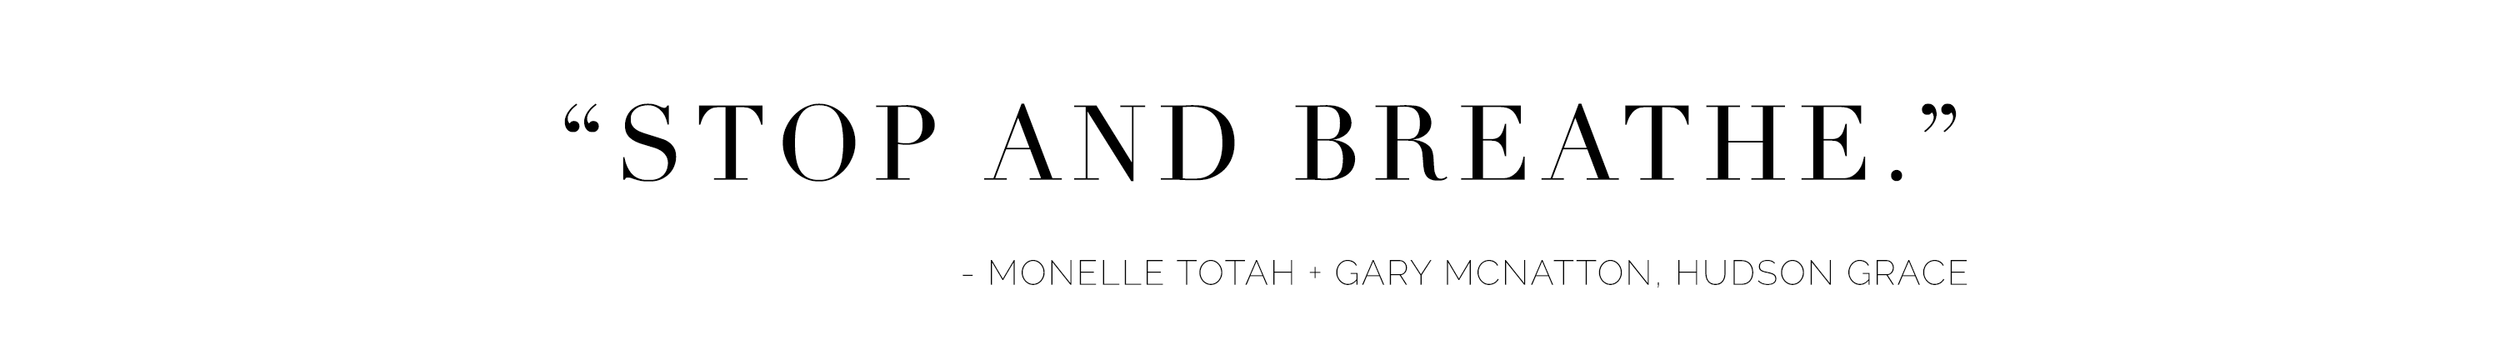 Alyssa Rosenheck's The New Southern Entrepreneur Spotlight with Monelle Totah + Gary McNatton, Founders of Hudson Grace of San Francisco, CA